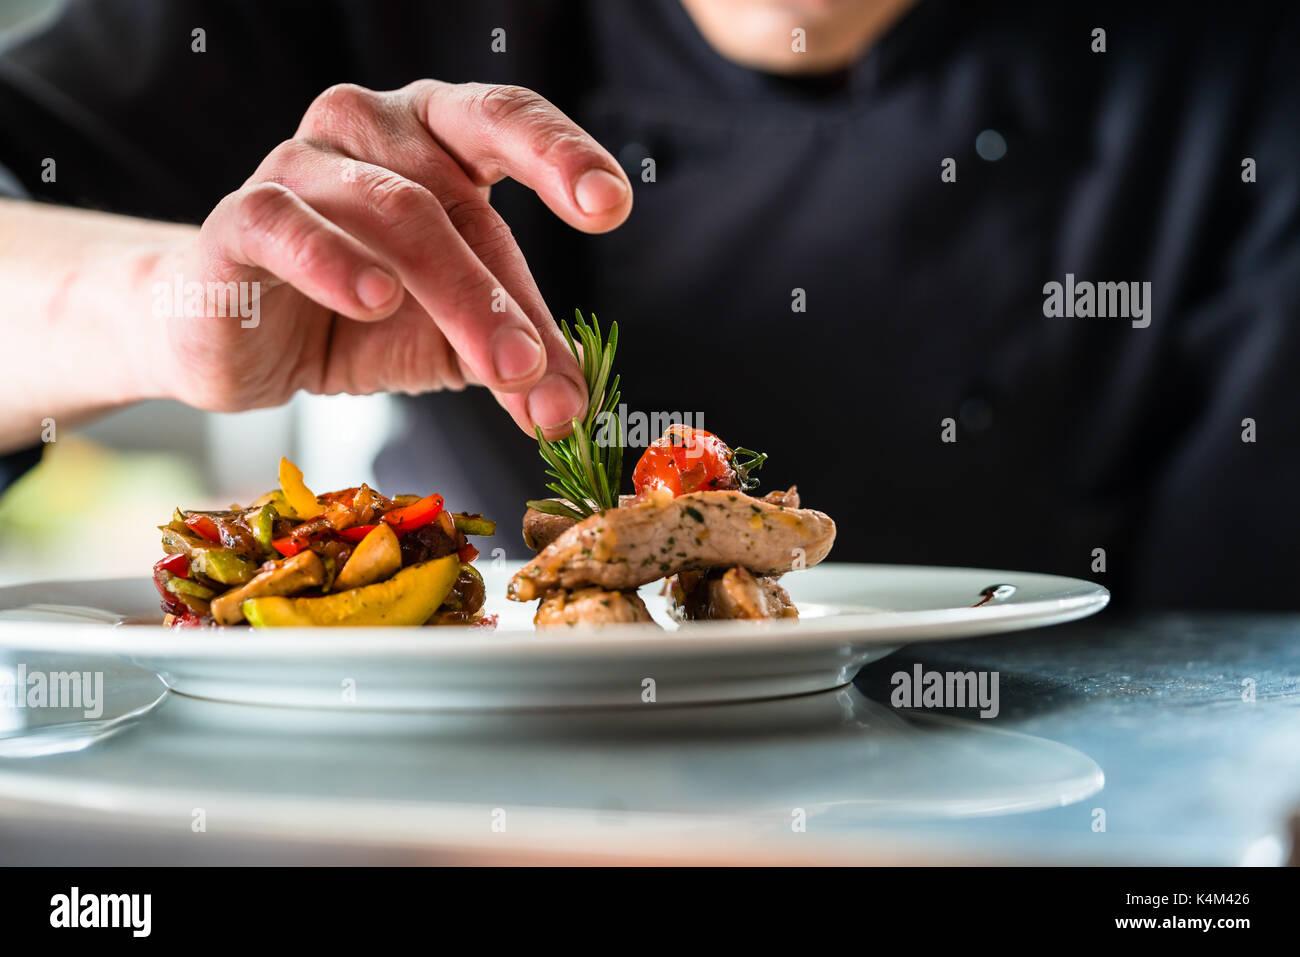 Chef finishing and garnishing food he prepared - Stock Image